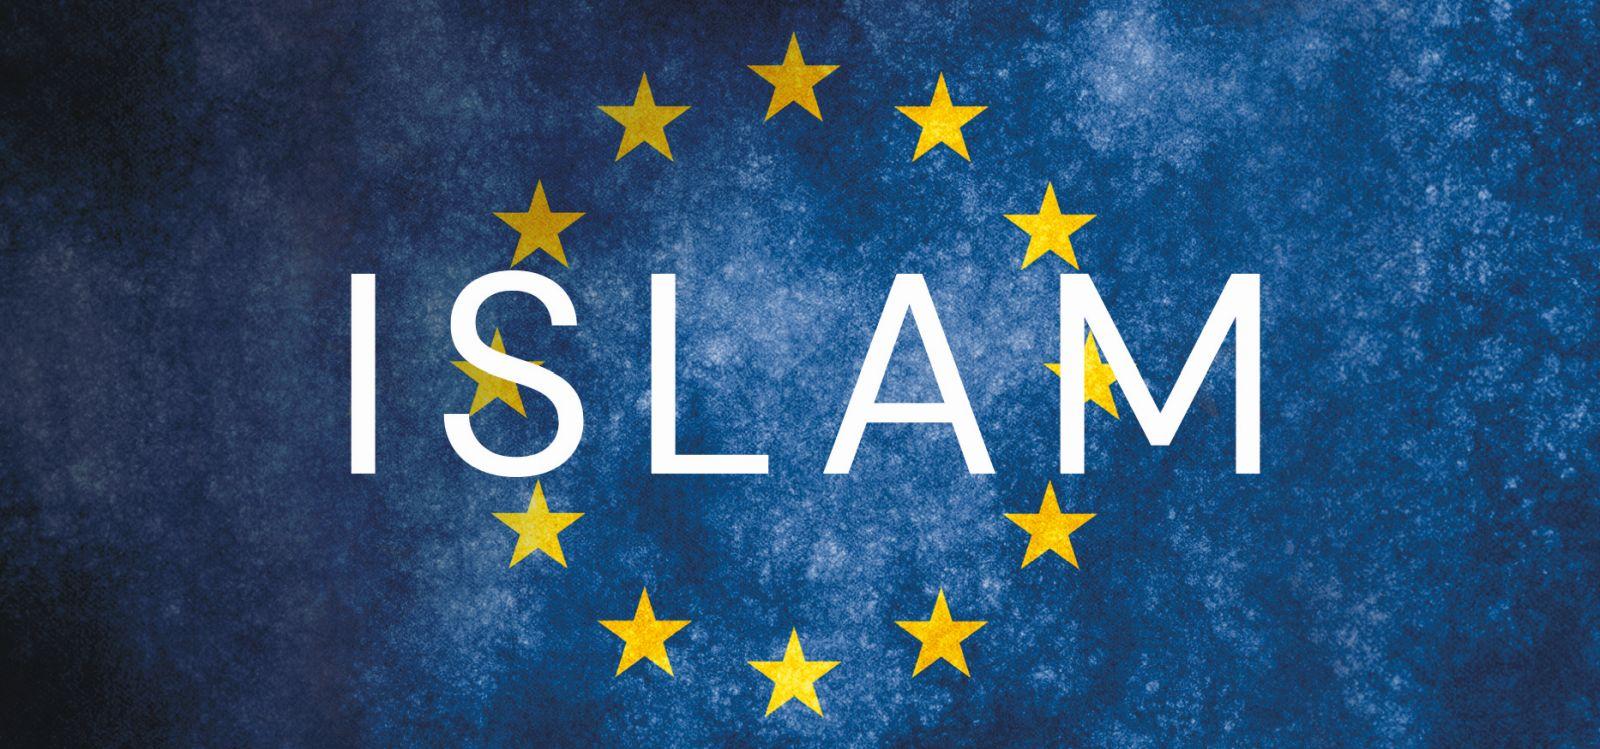 Islam i Europa - sukob civilizacija, Hazreti Mirza Masroor Ahmad, Peti Kalifa Obećanog Mesije